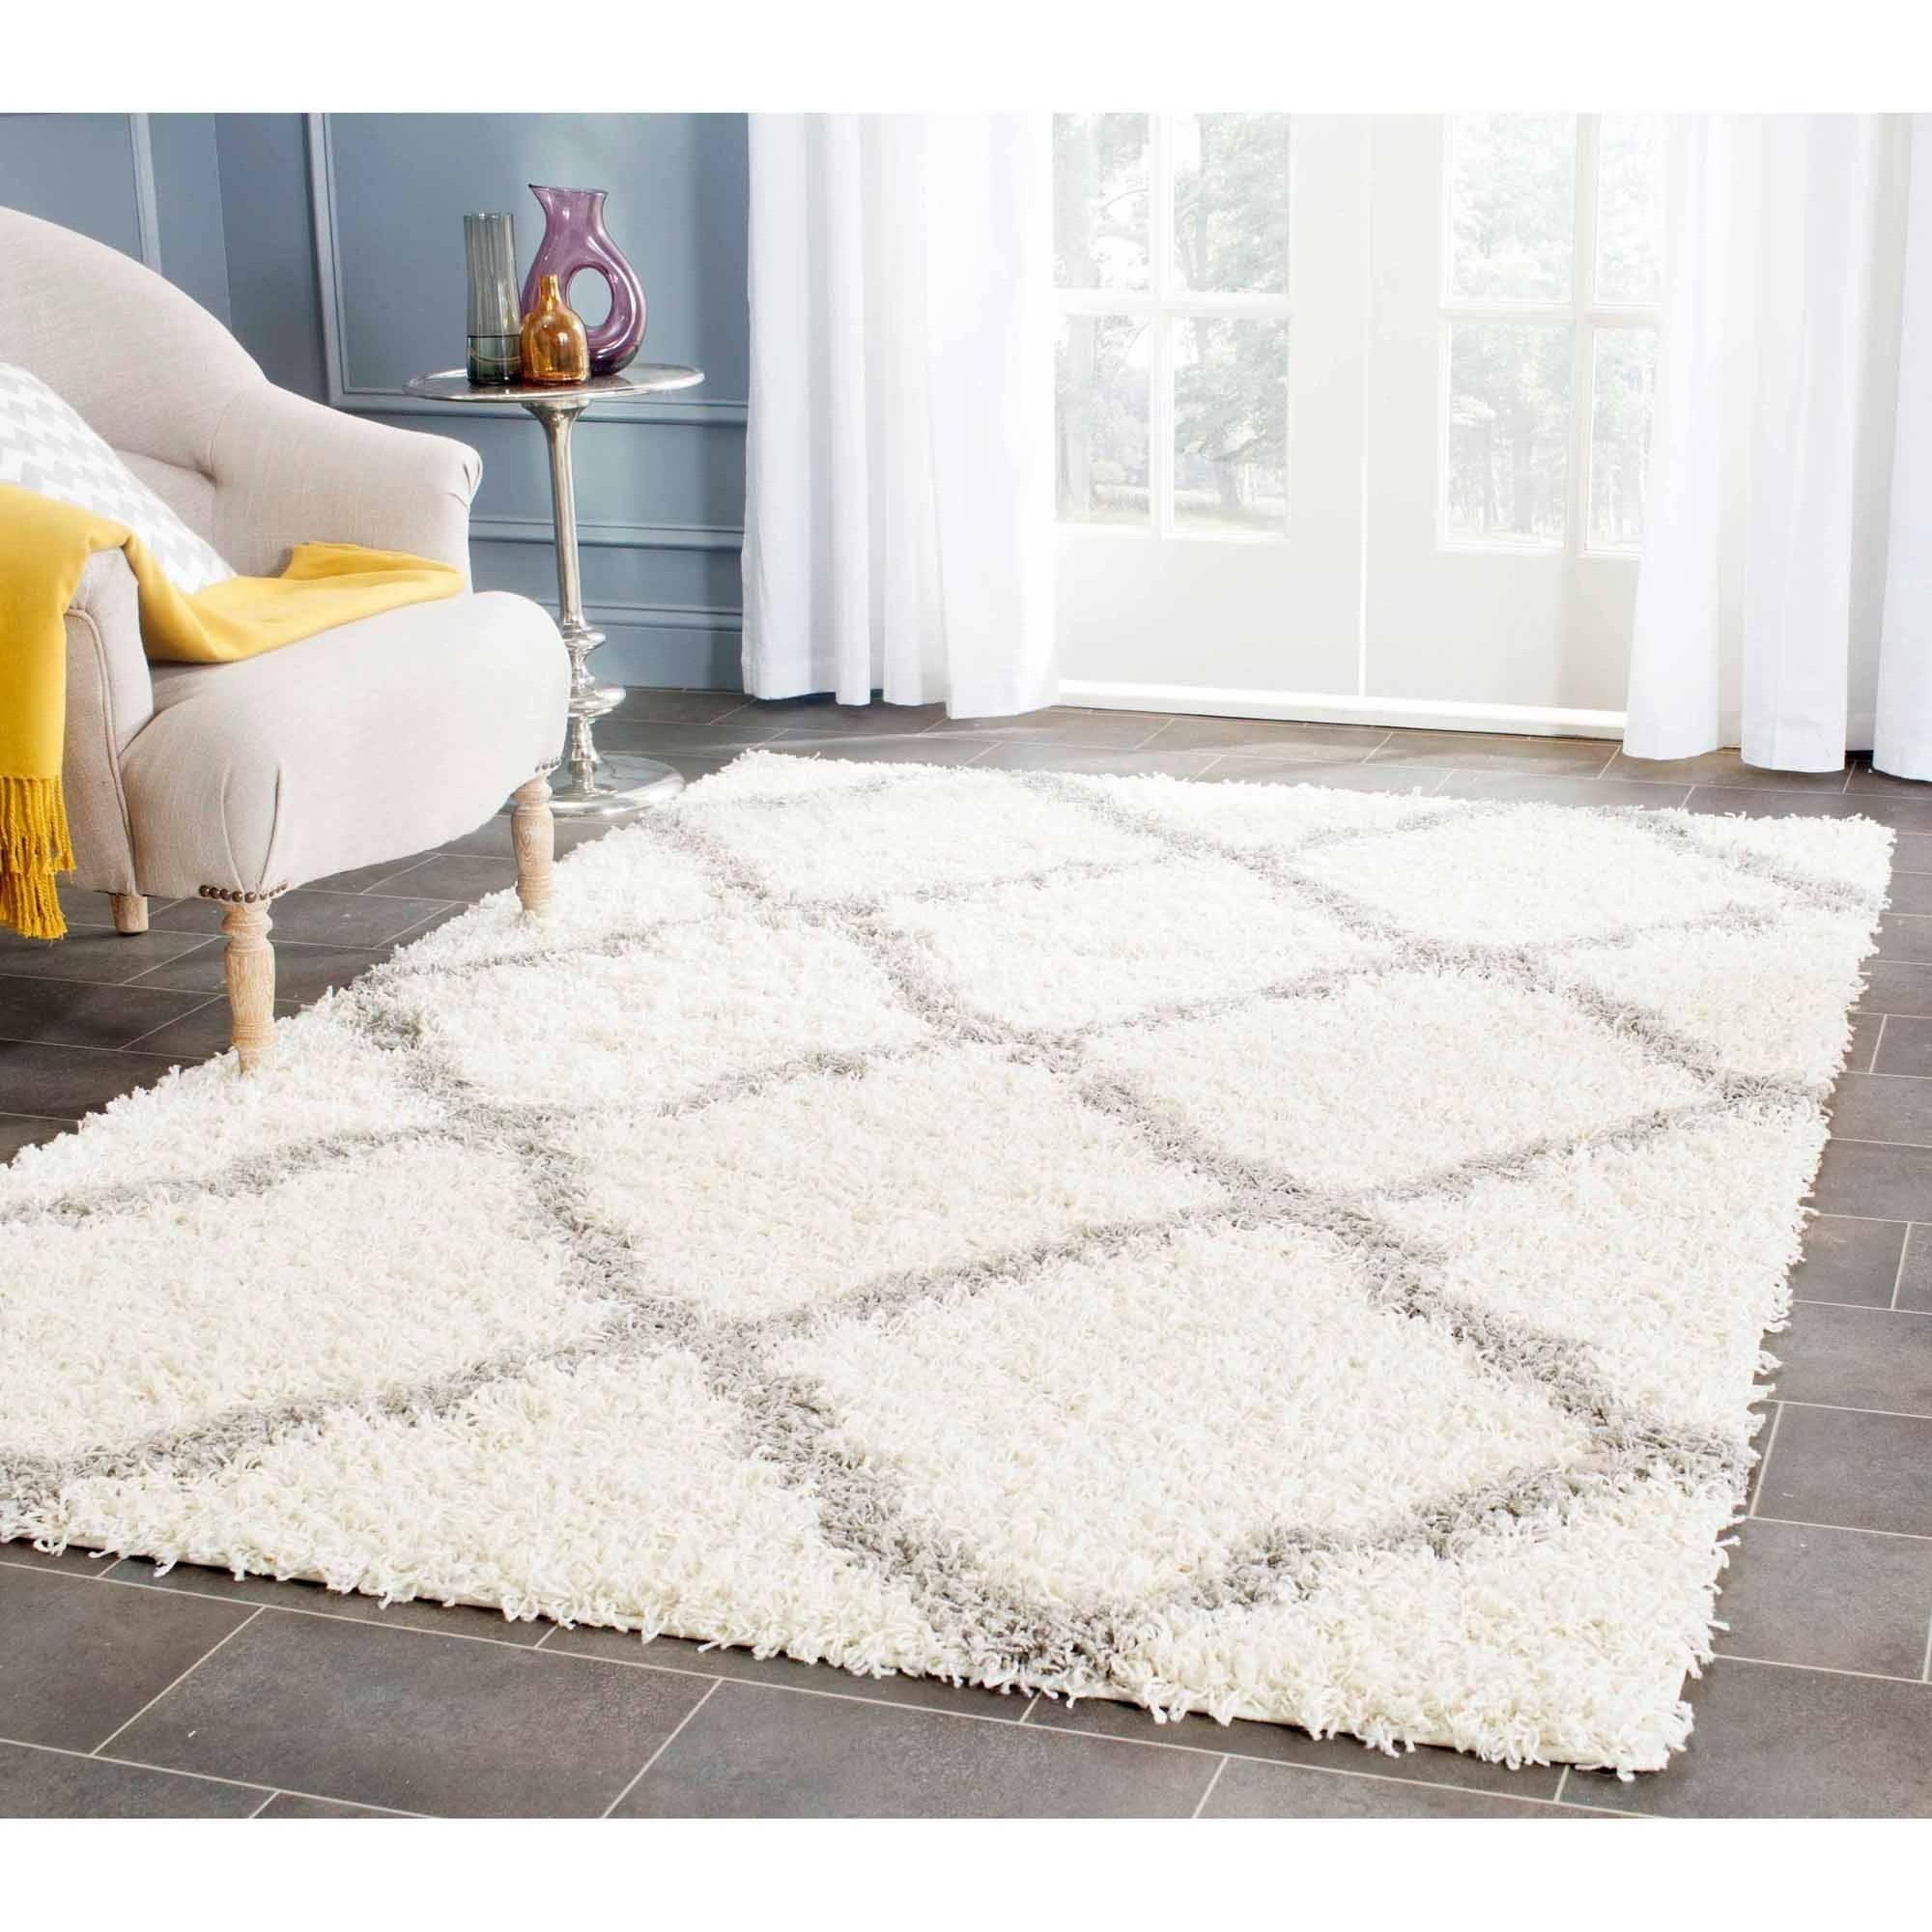 safavieh rugs safavieh dallas power-loomed shag area rug - walmart.com PLKFNRQ